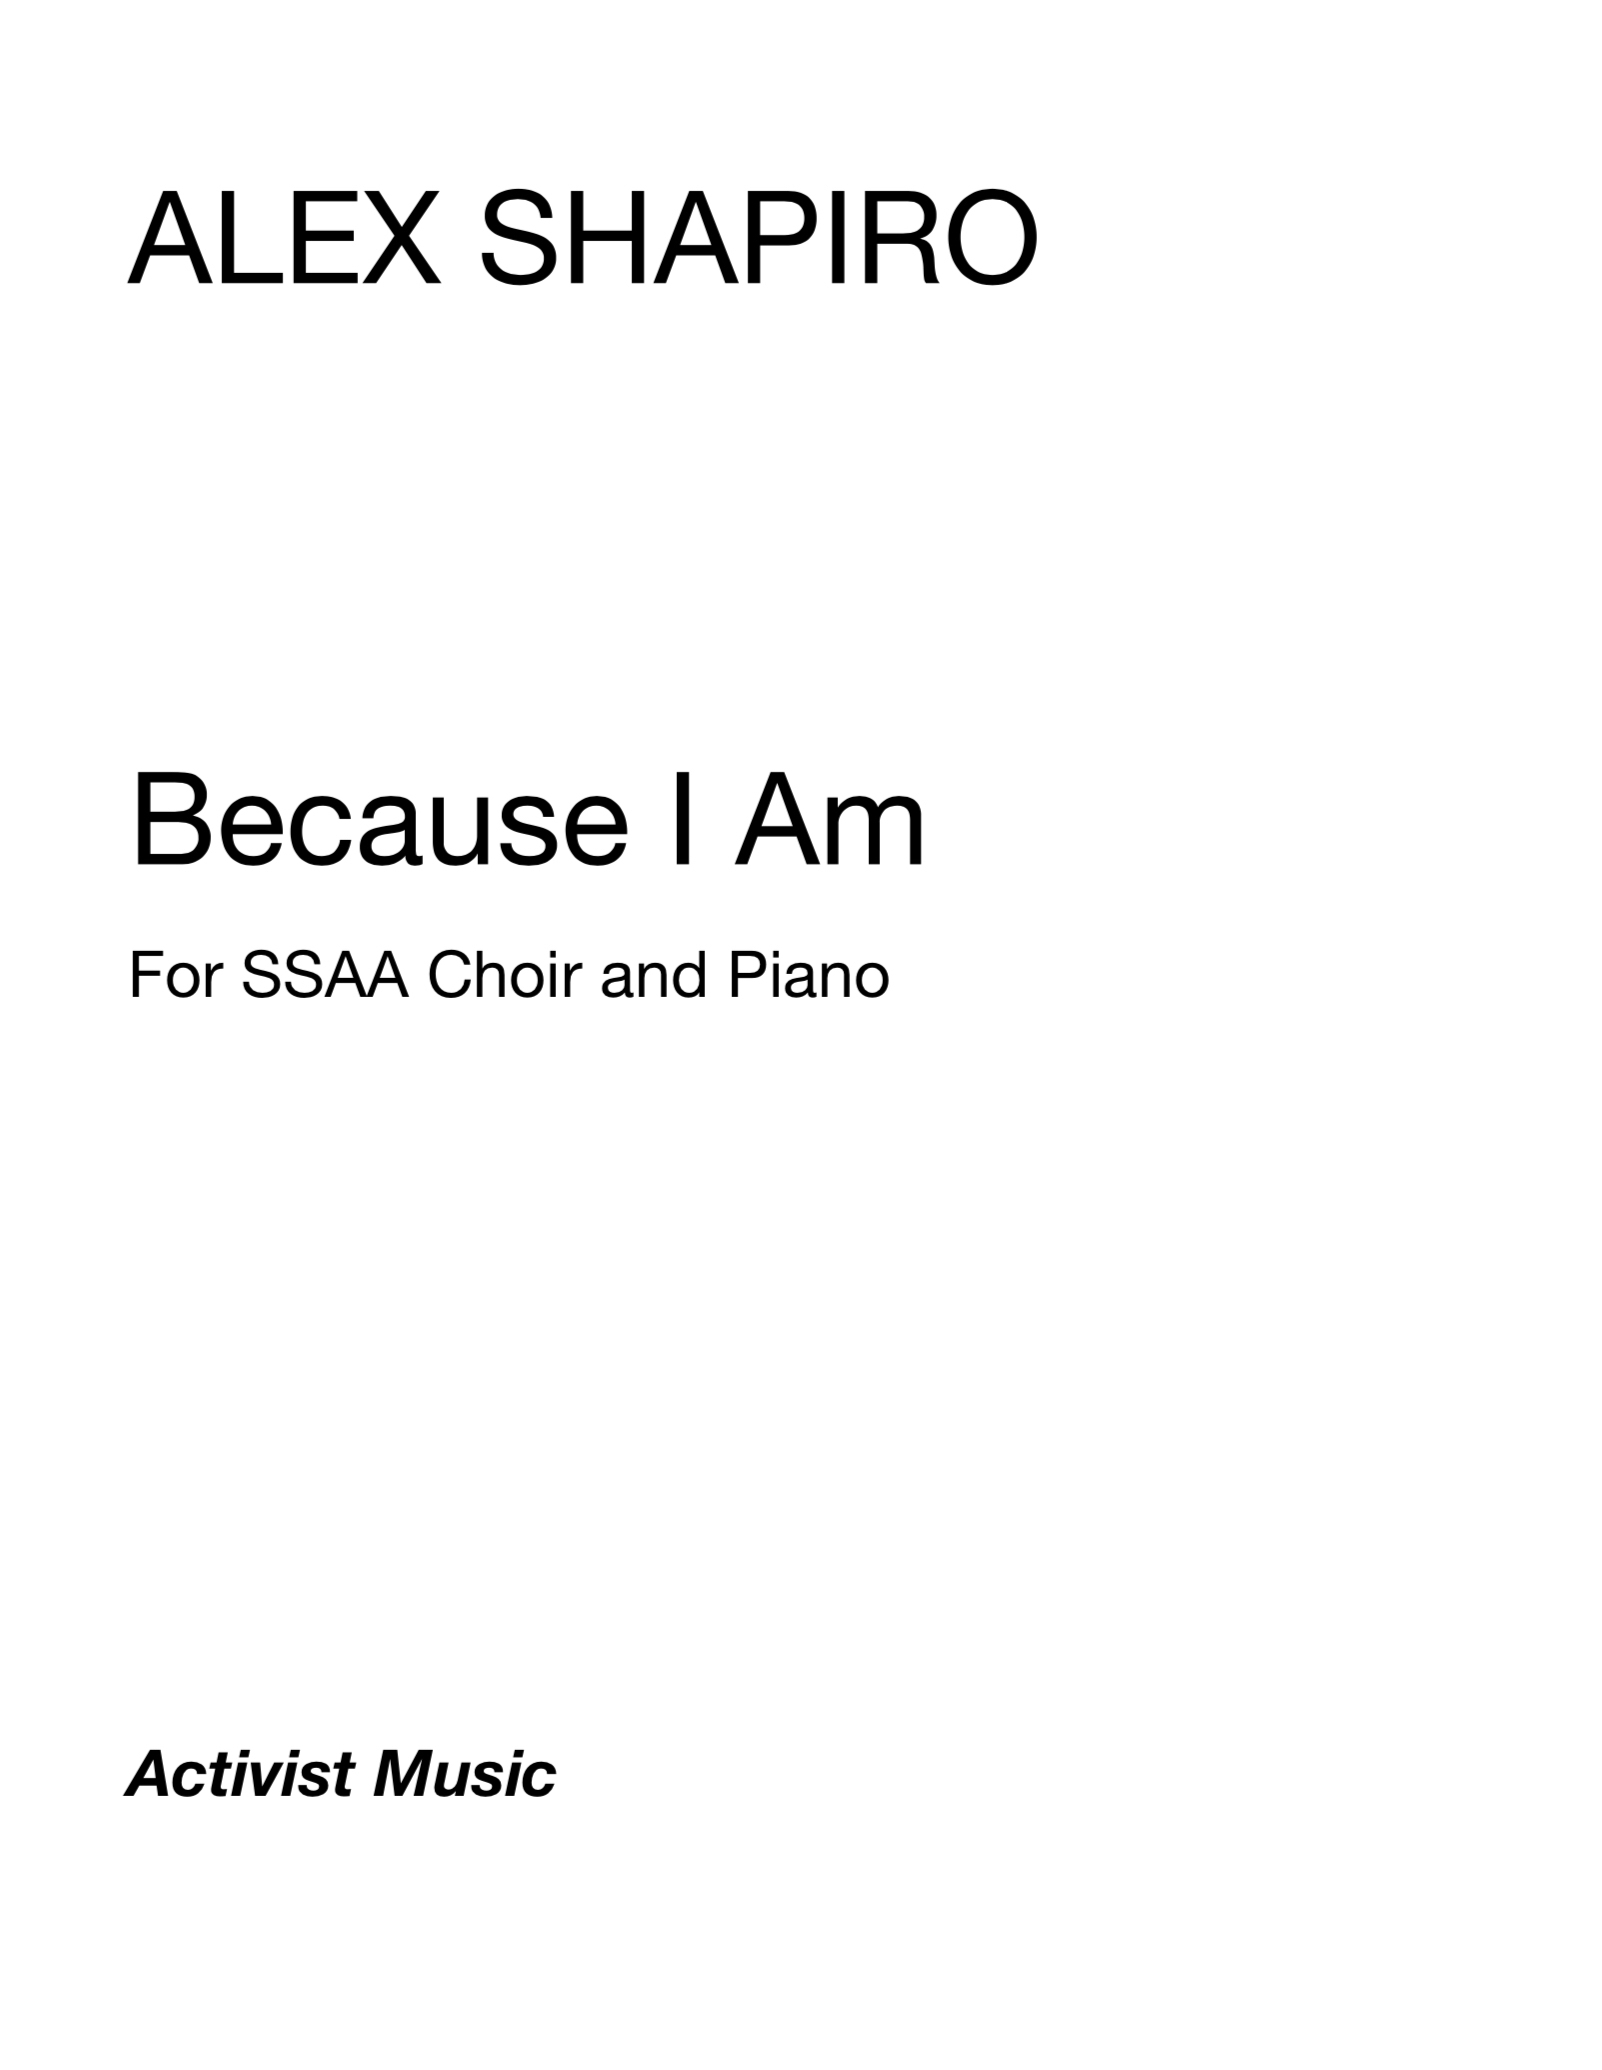 Because I Am by Alex Shapiro